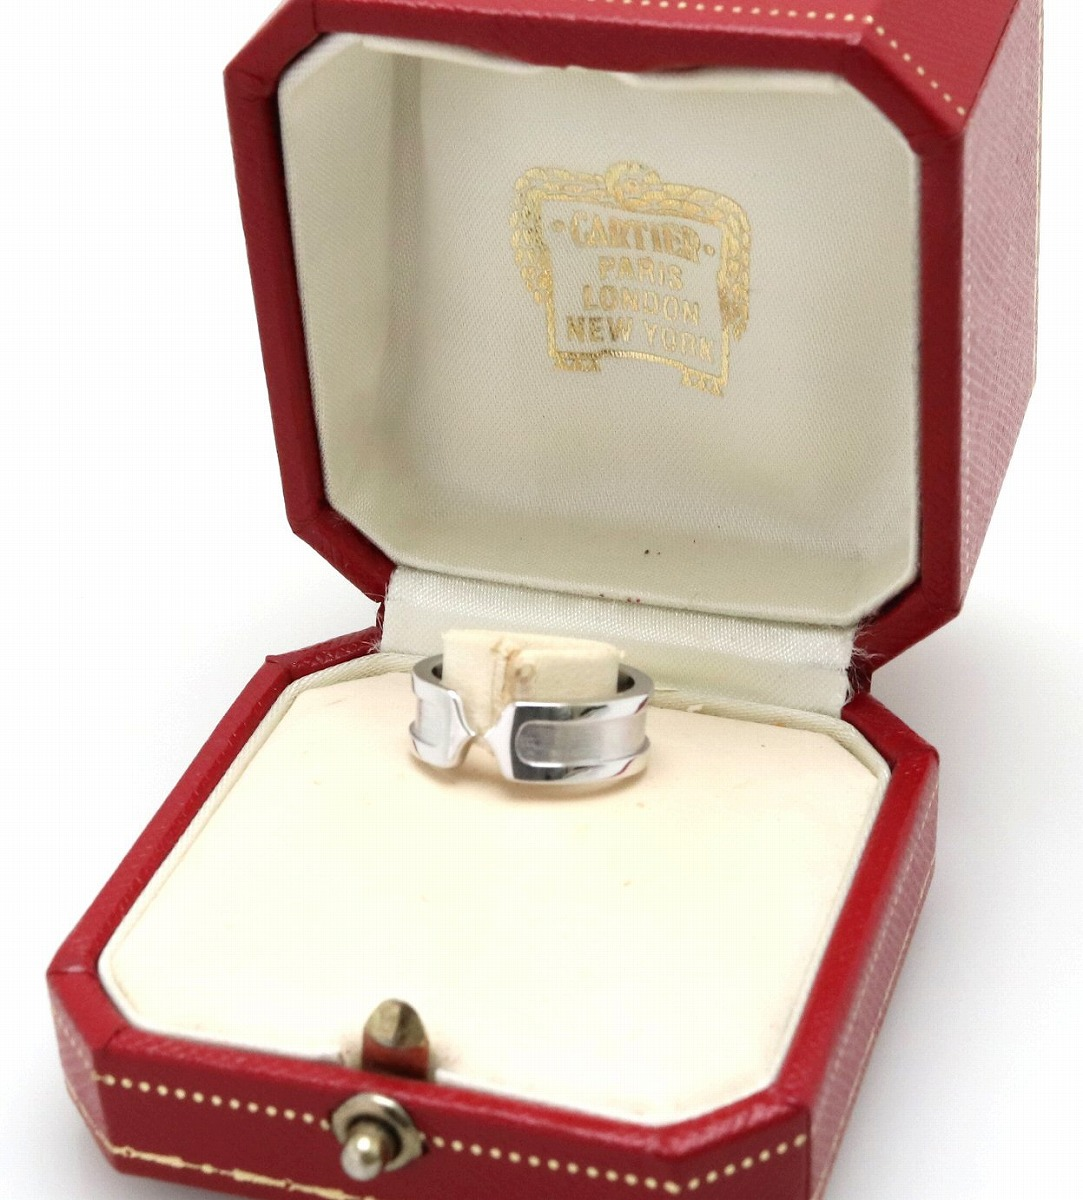 S様ご予約品 ジュエリー Cartier カルティエ 2C ロゴ モチーフ リング 指輪 K18WG ホワイトゴールド 9号49 C2 B4040500 B4040549kIgbfY76yv